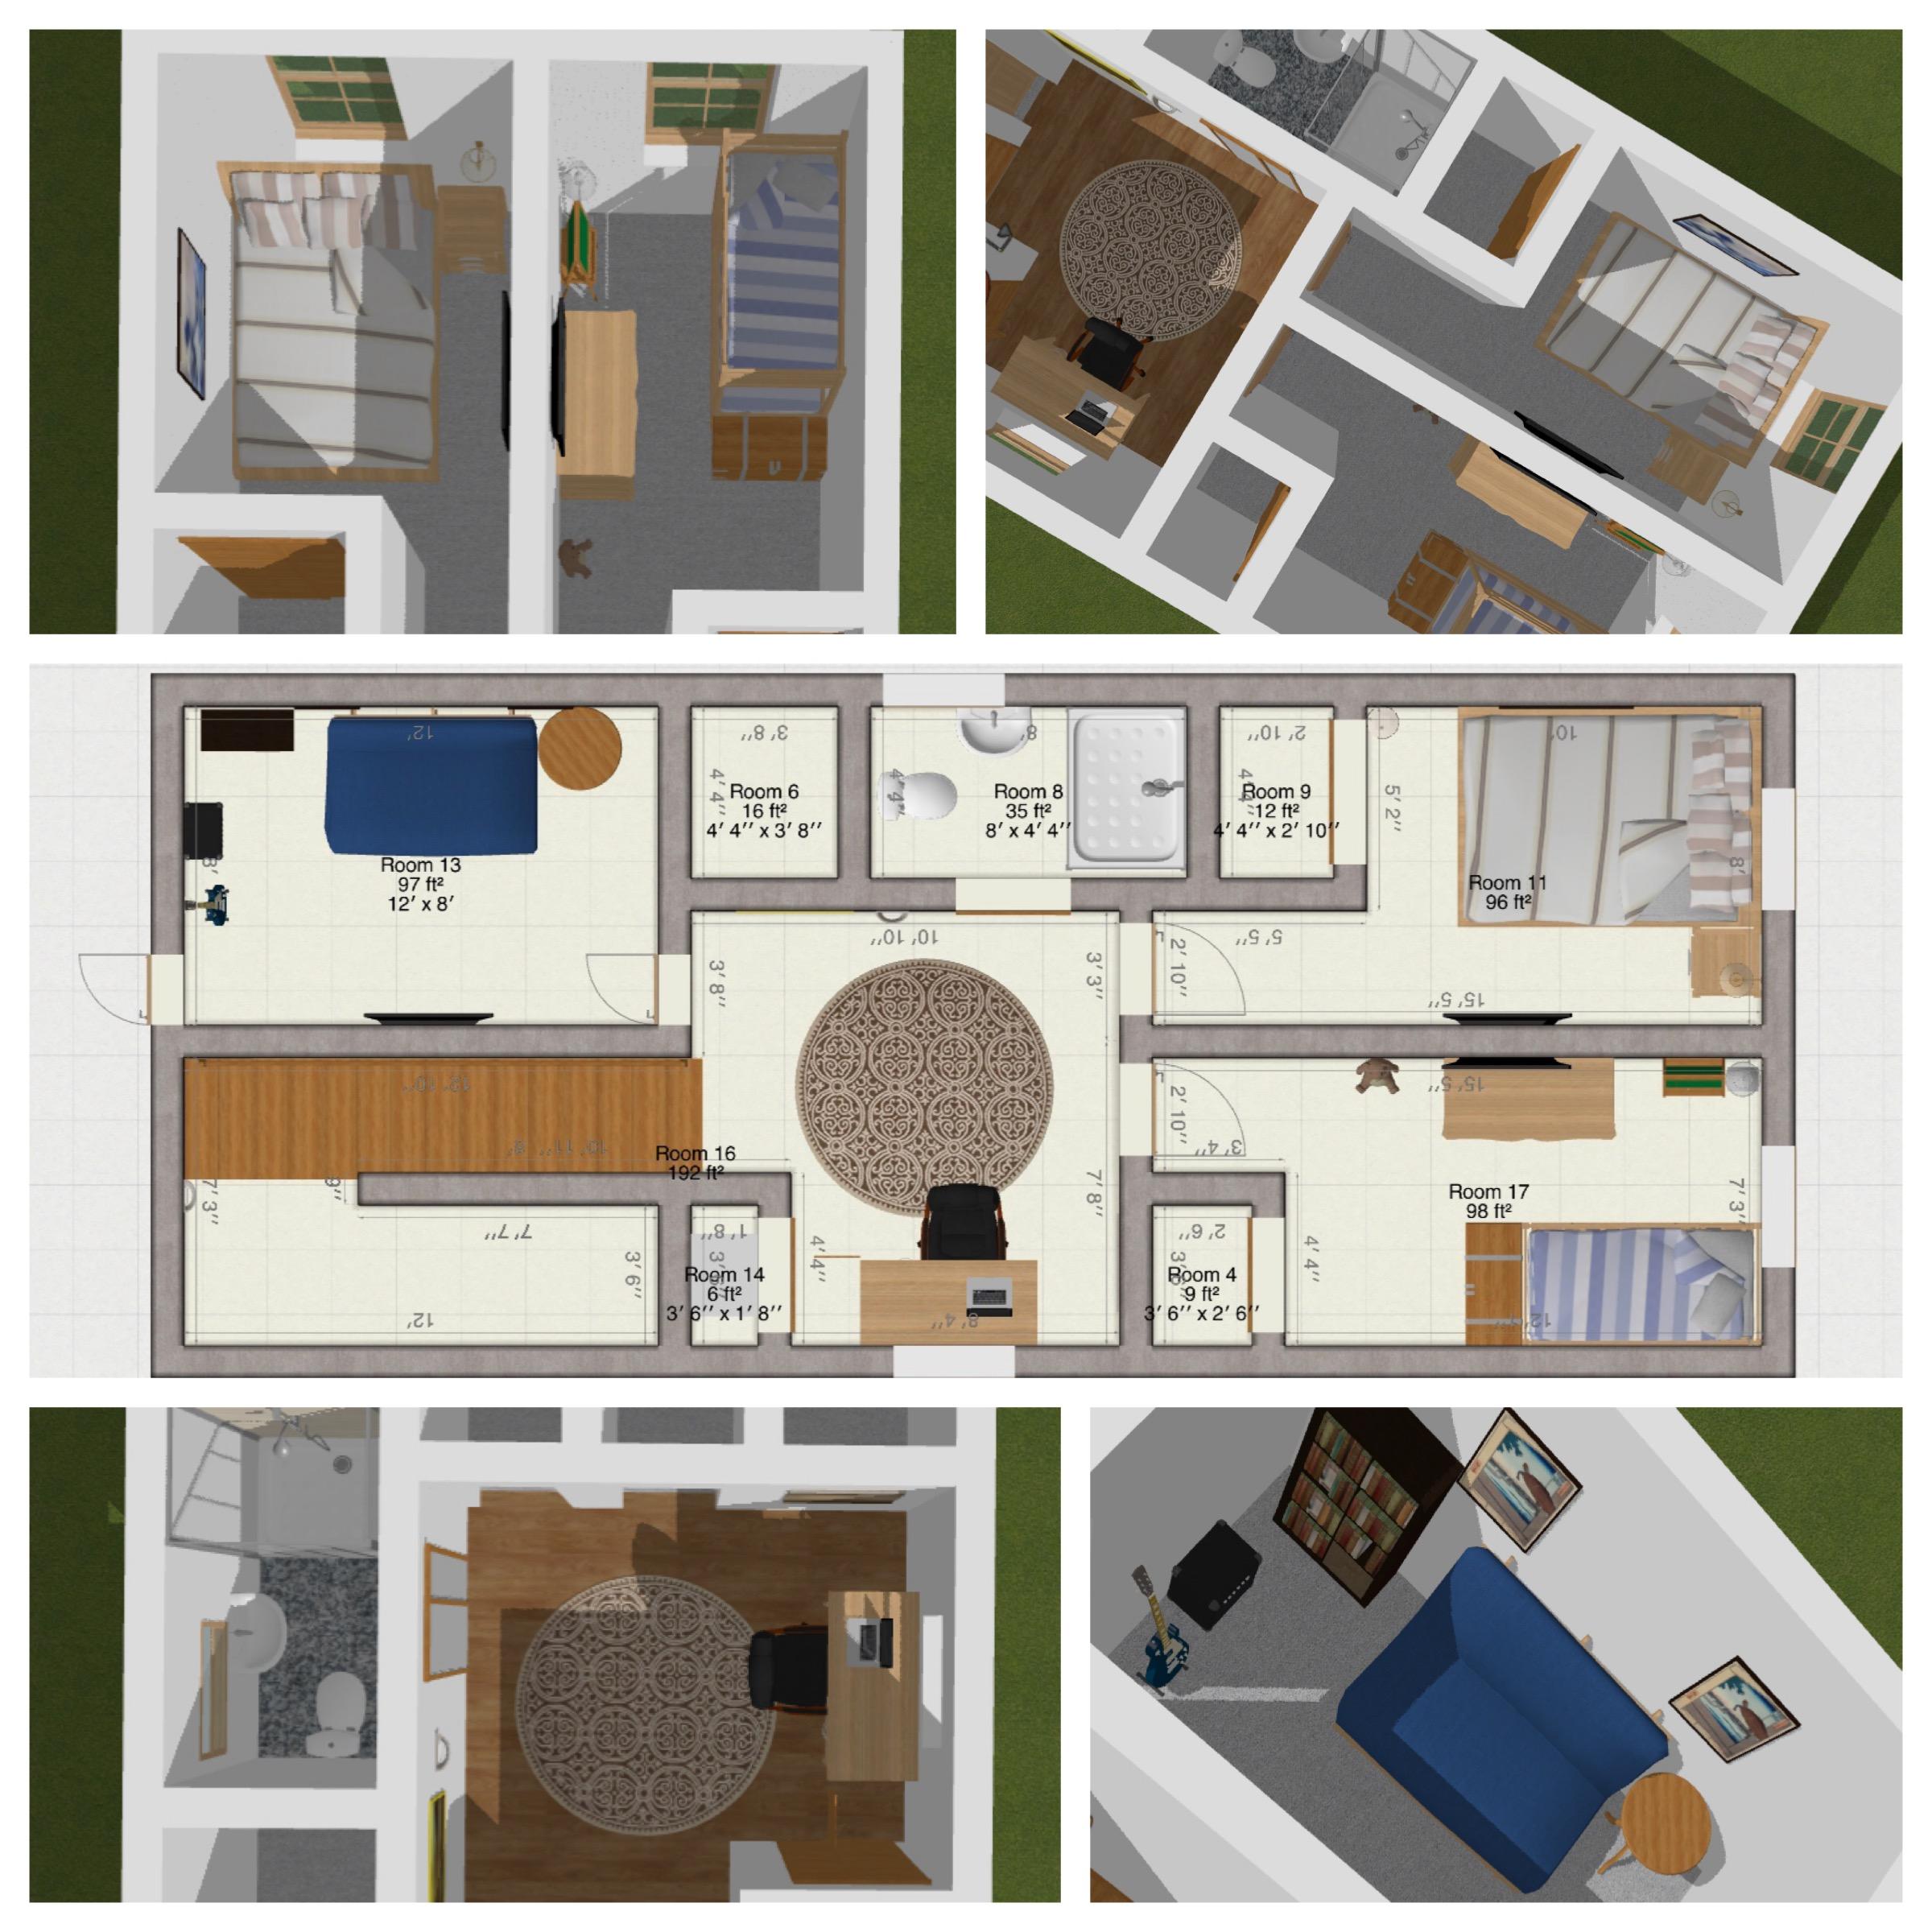 Second Floor Collage